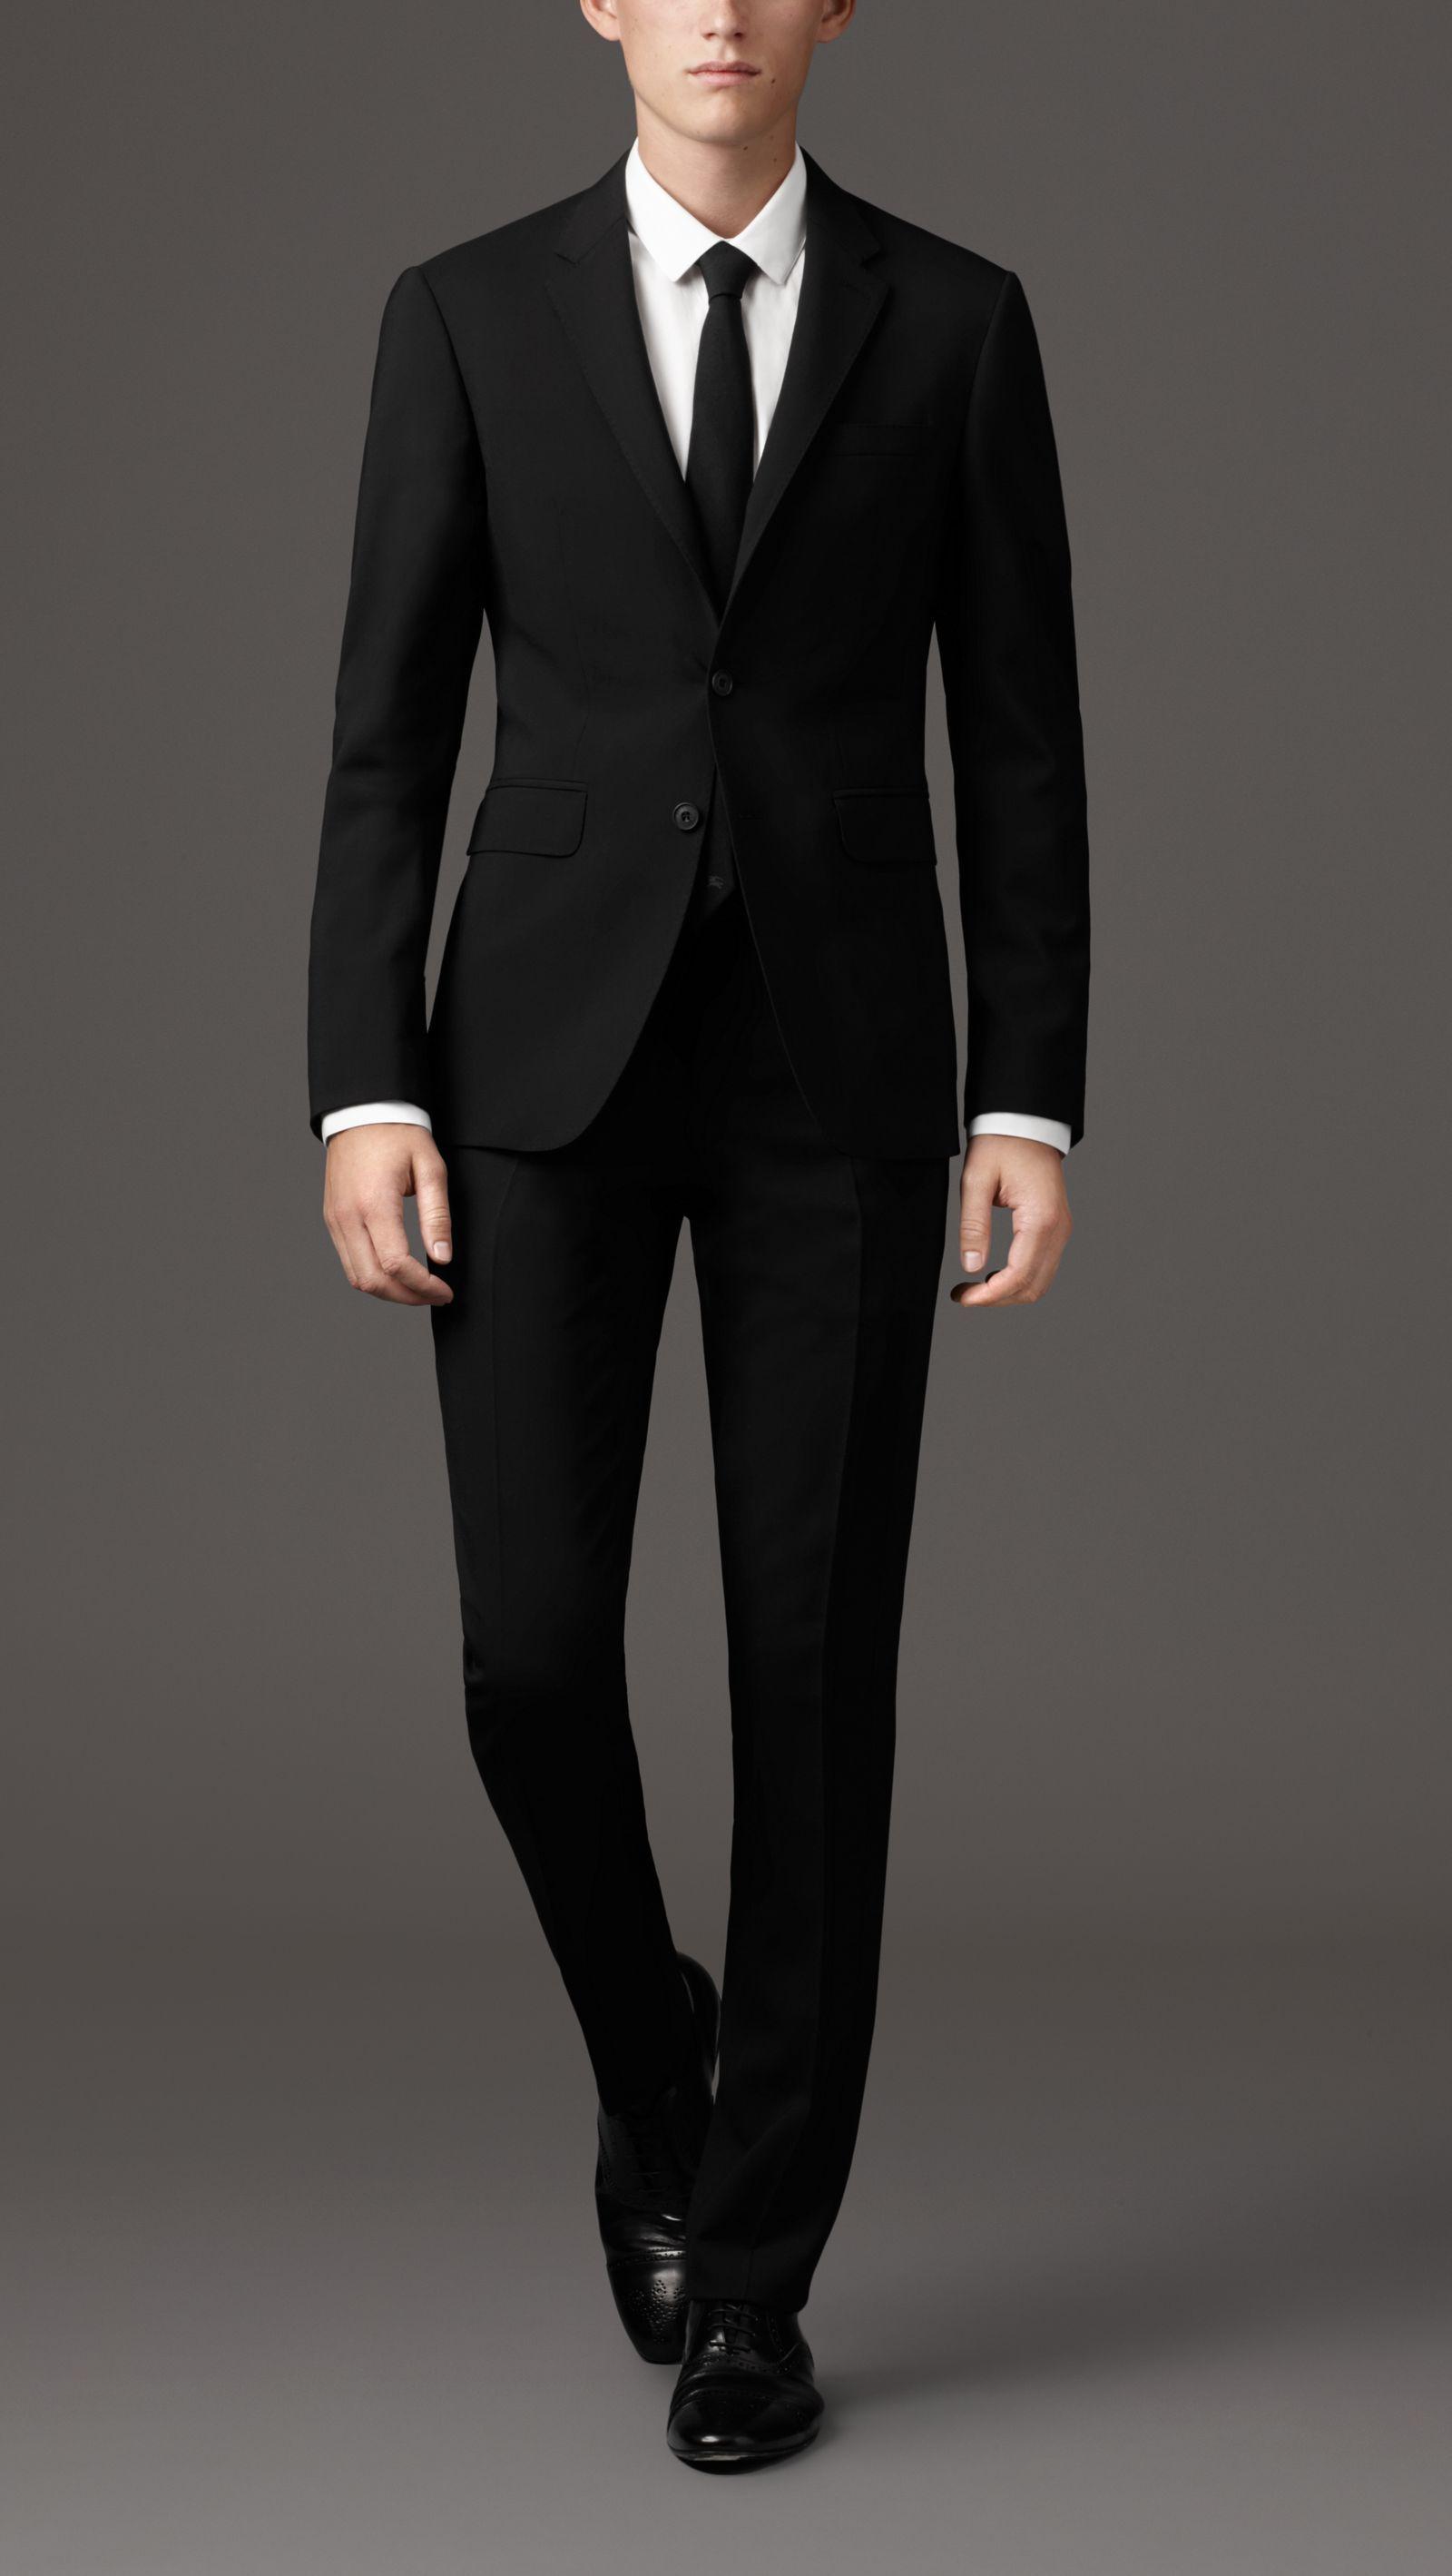 b0c36b605 Men's Suits & Blazers   Sale   Burberry in 2019   Men's Fashion ...